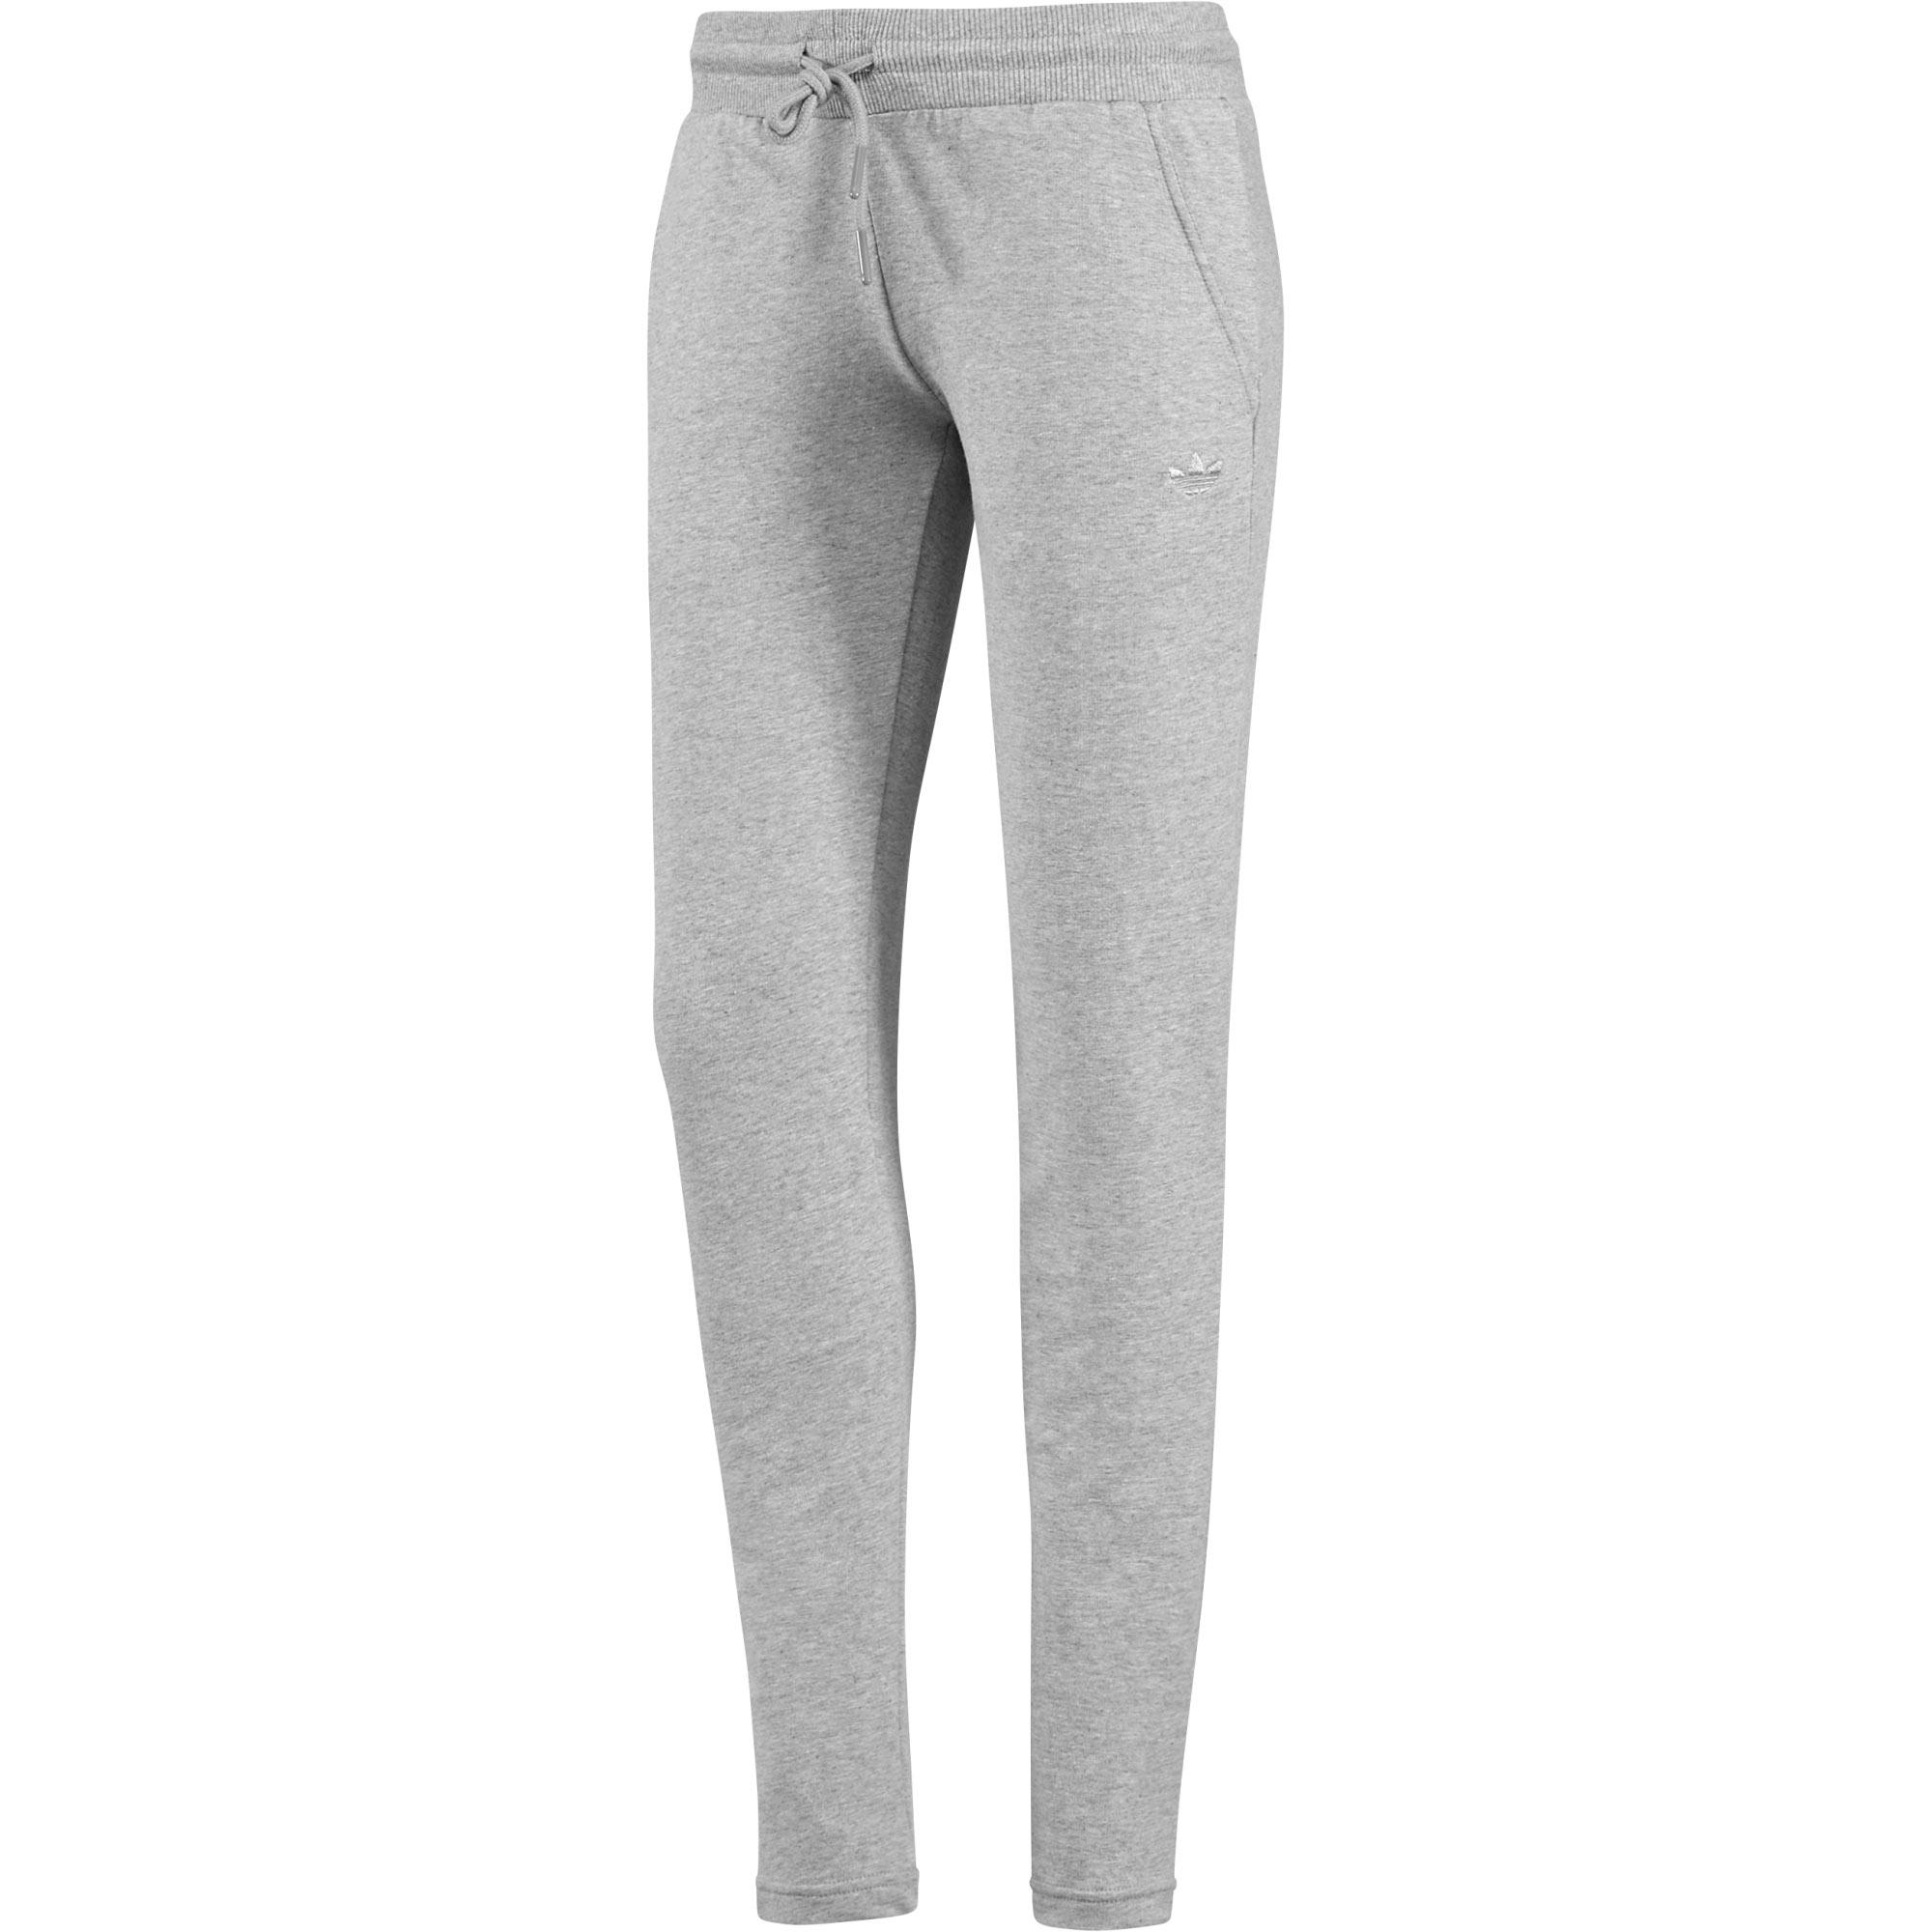 Femmes Pantalon ajusté en tissu éponge adidas | adidas France